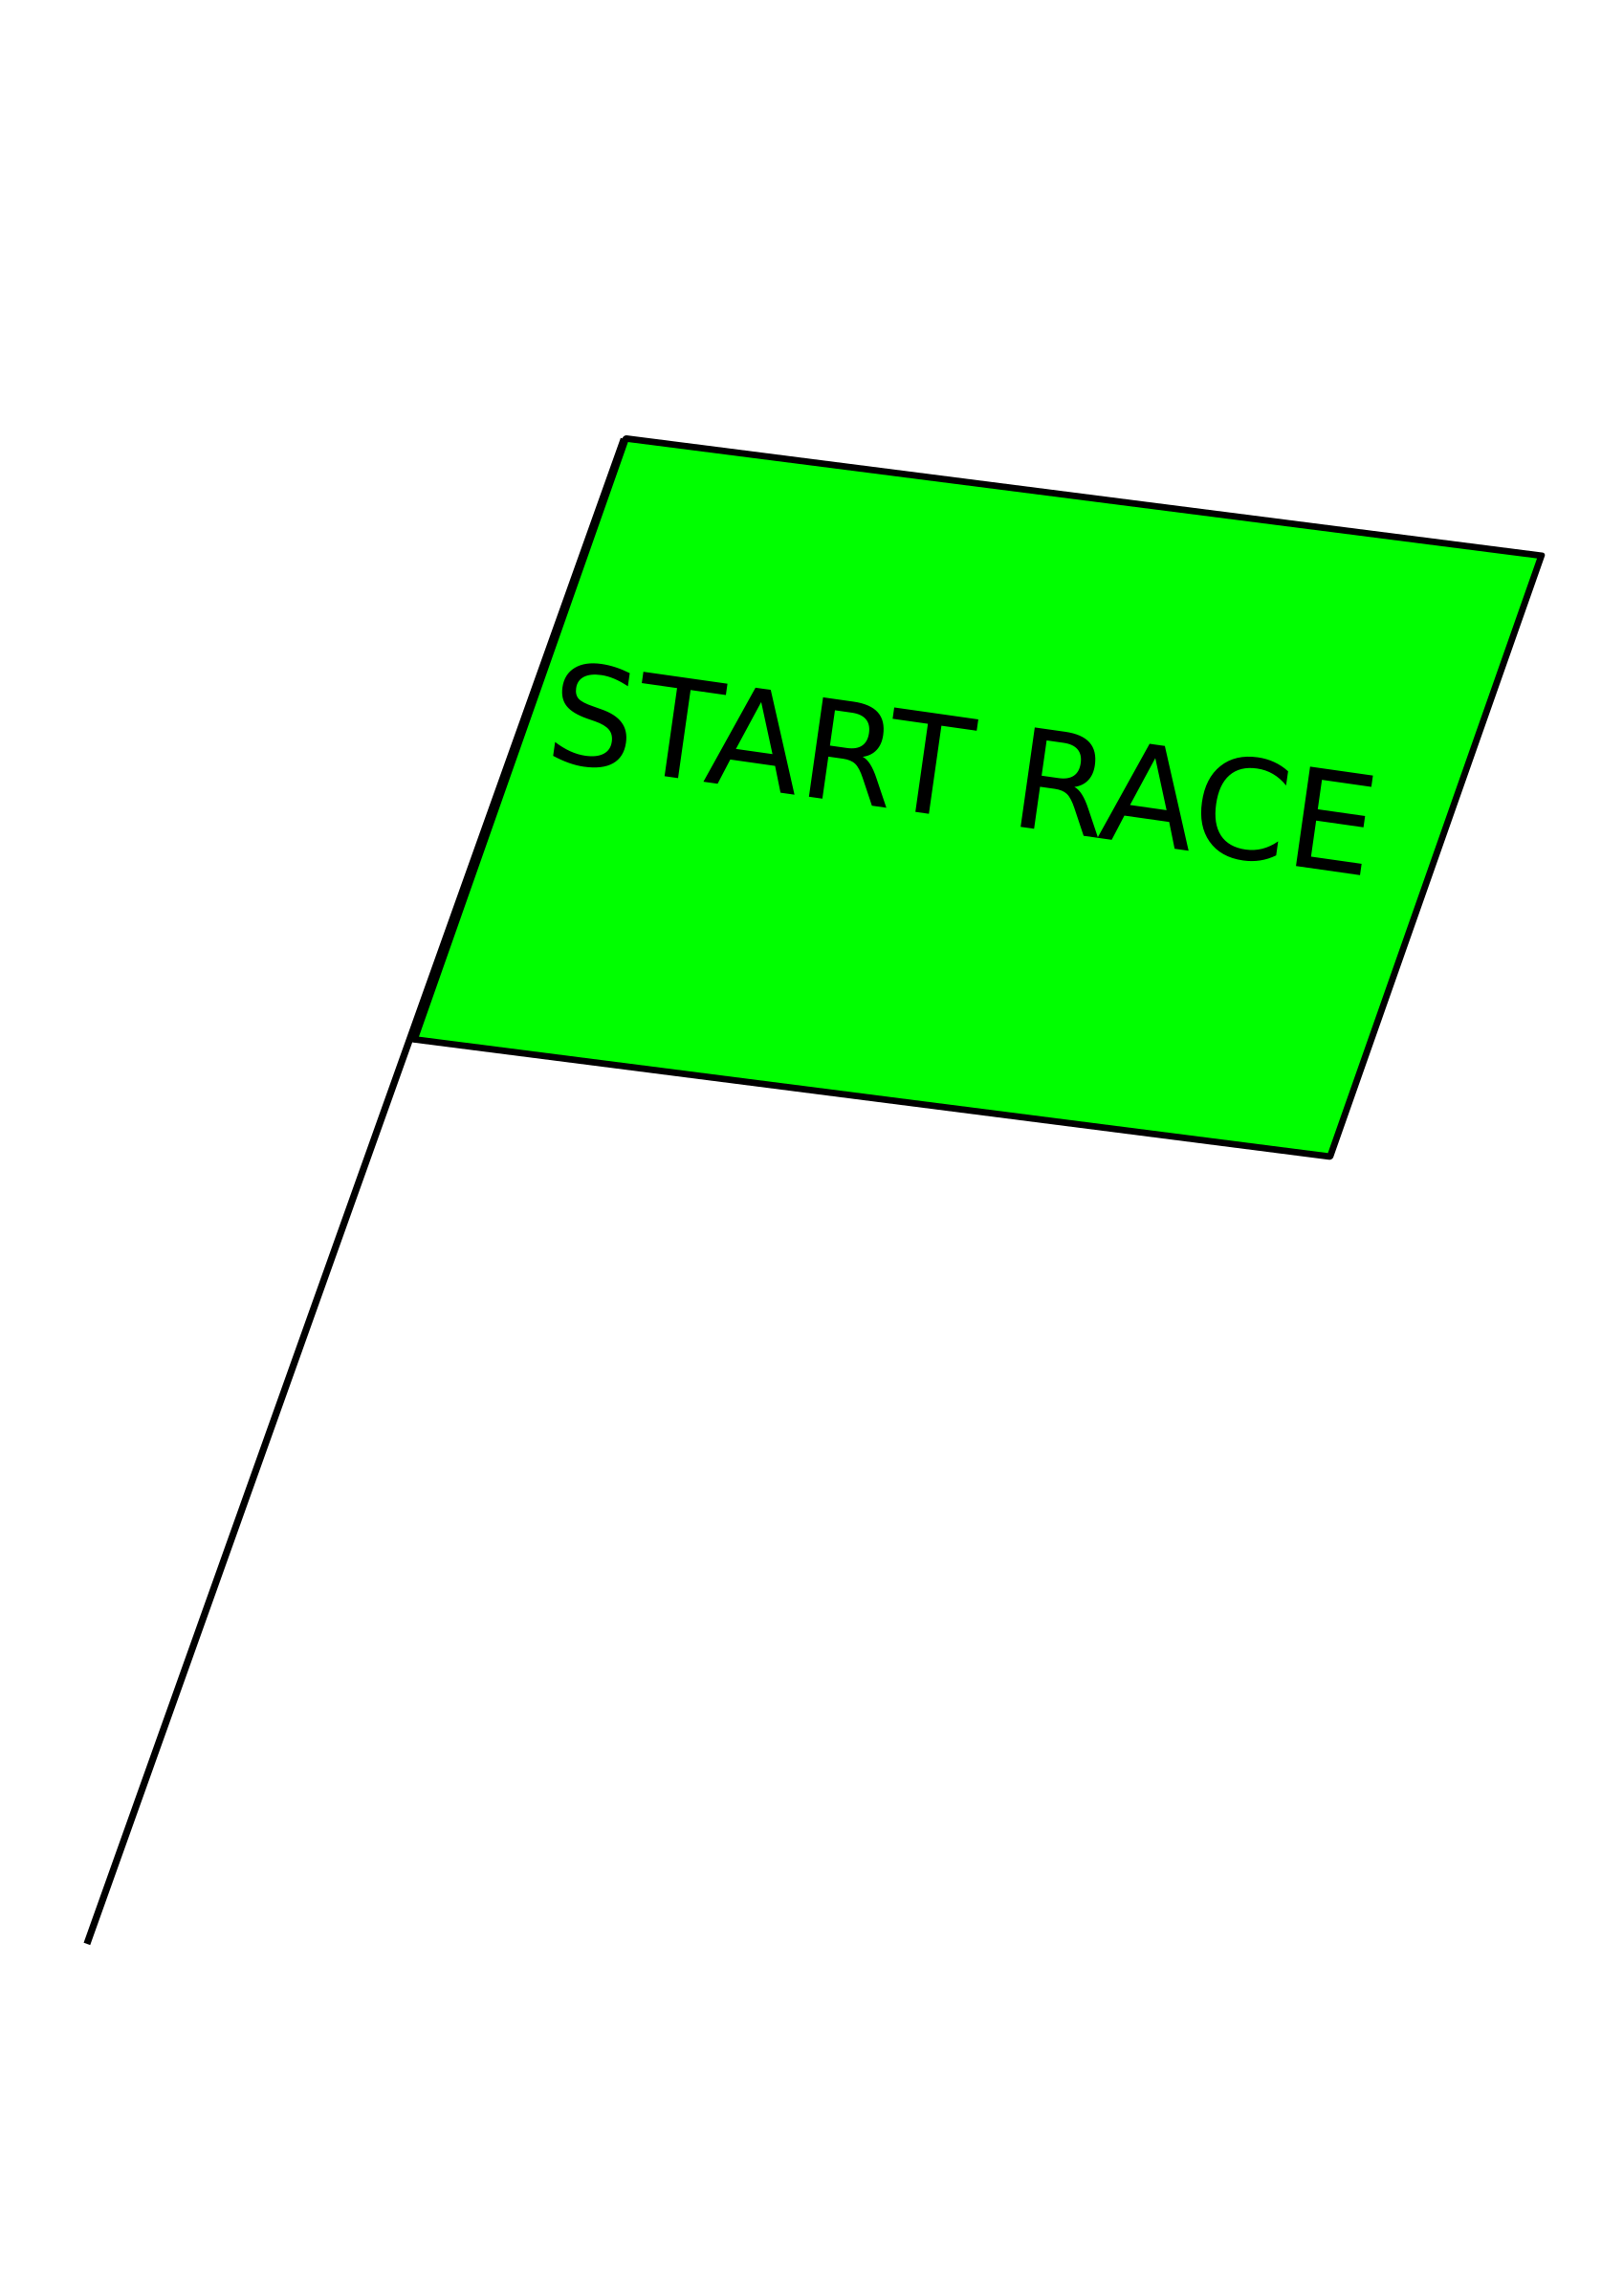 Race clipart end race. Green flag big image